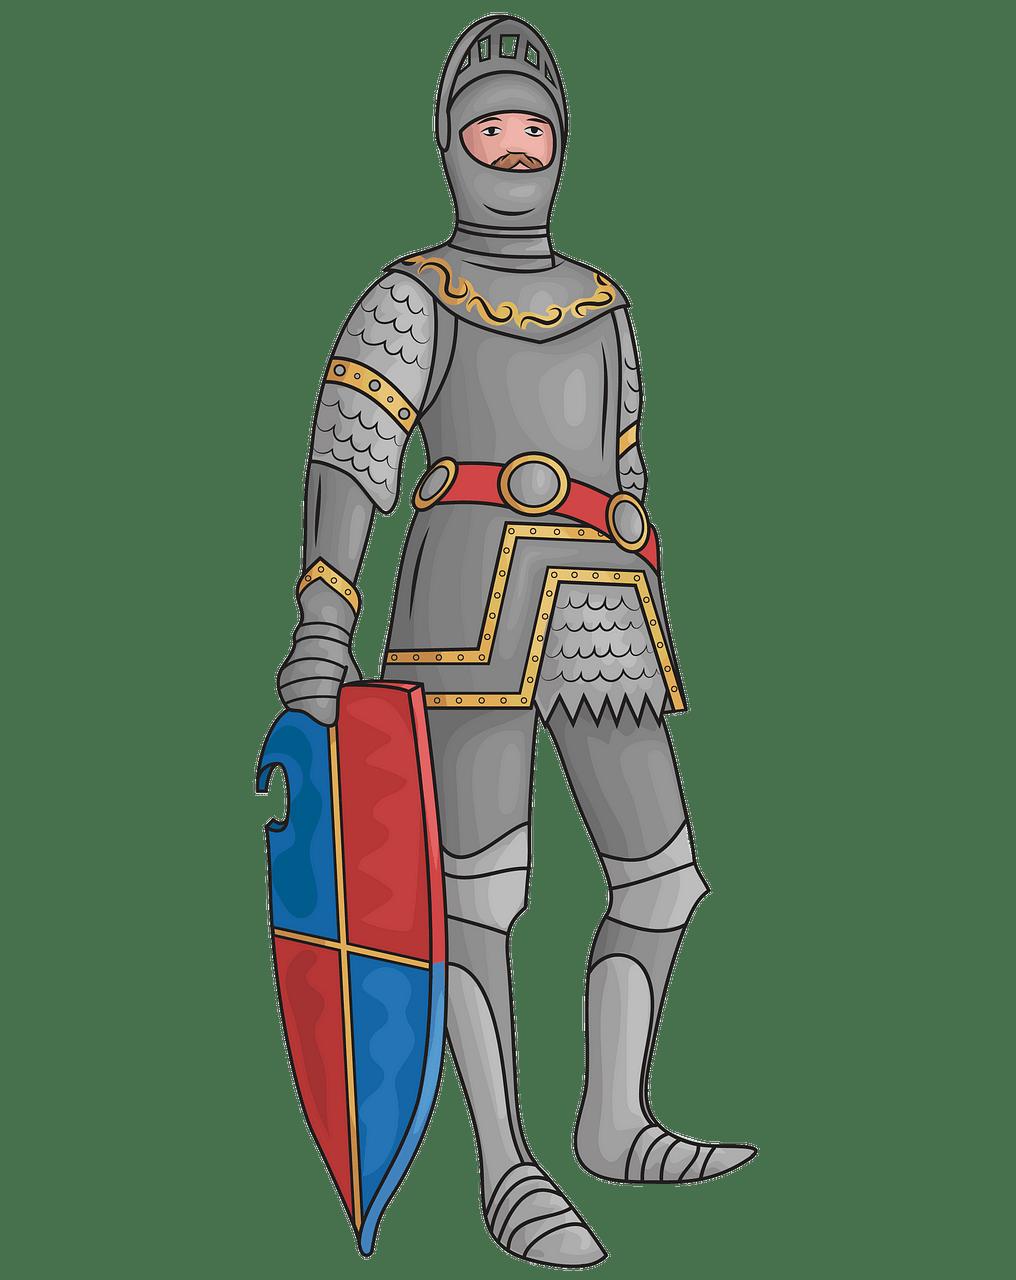 Statue of King Arthur in Innsbruck clipart. Free download.